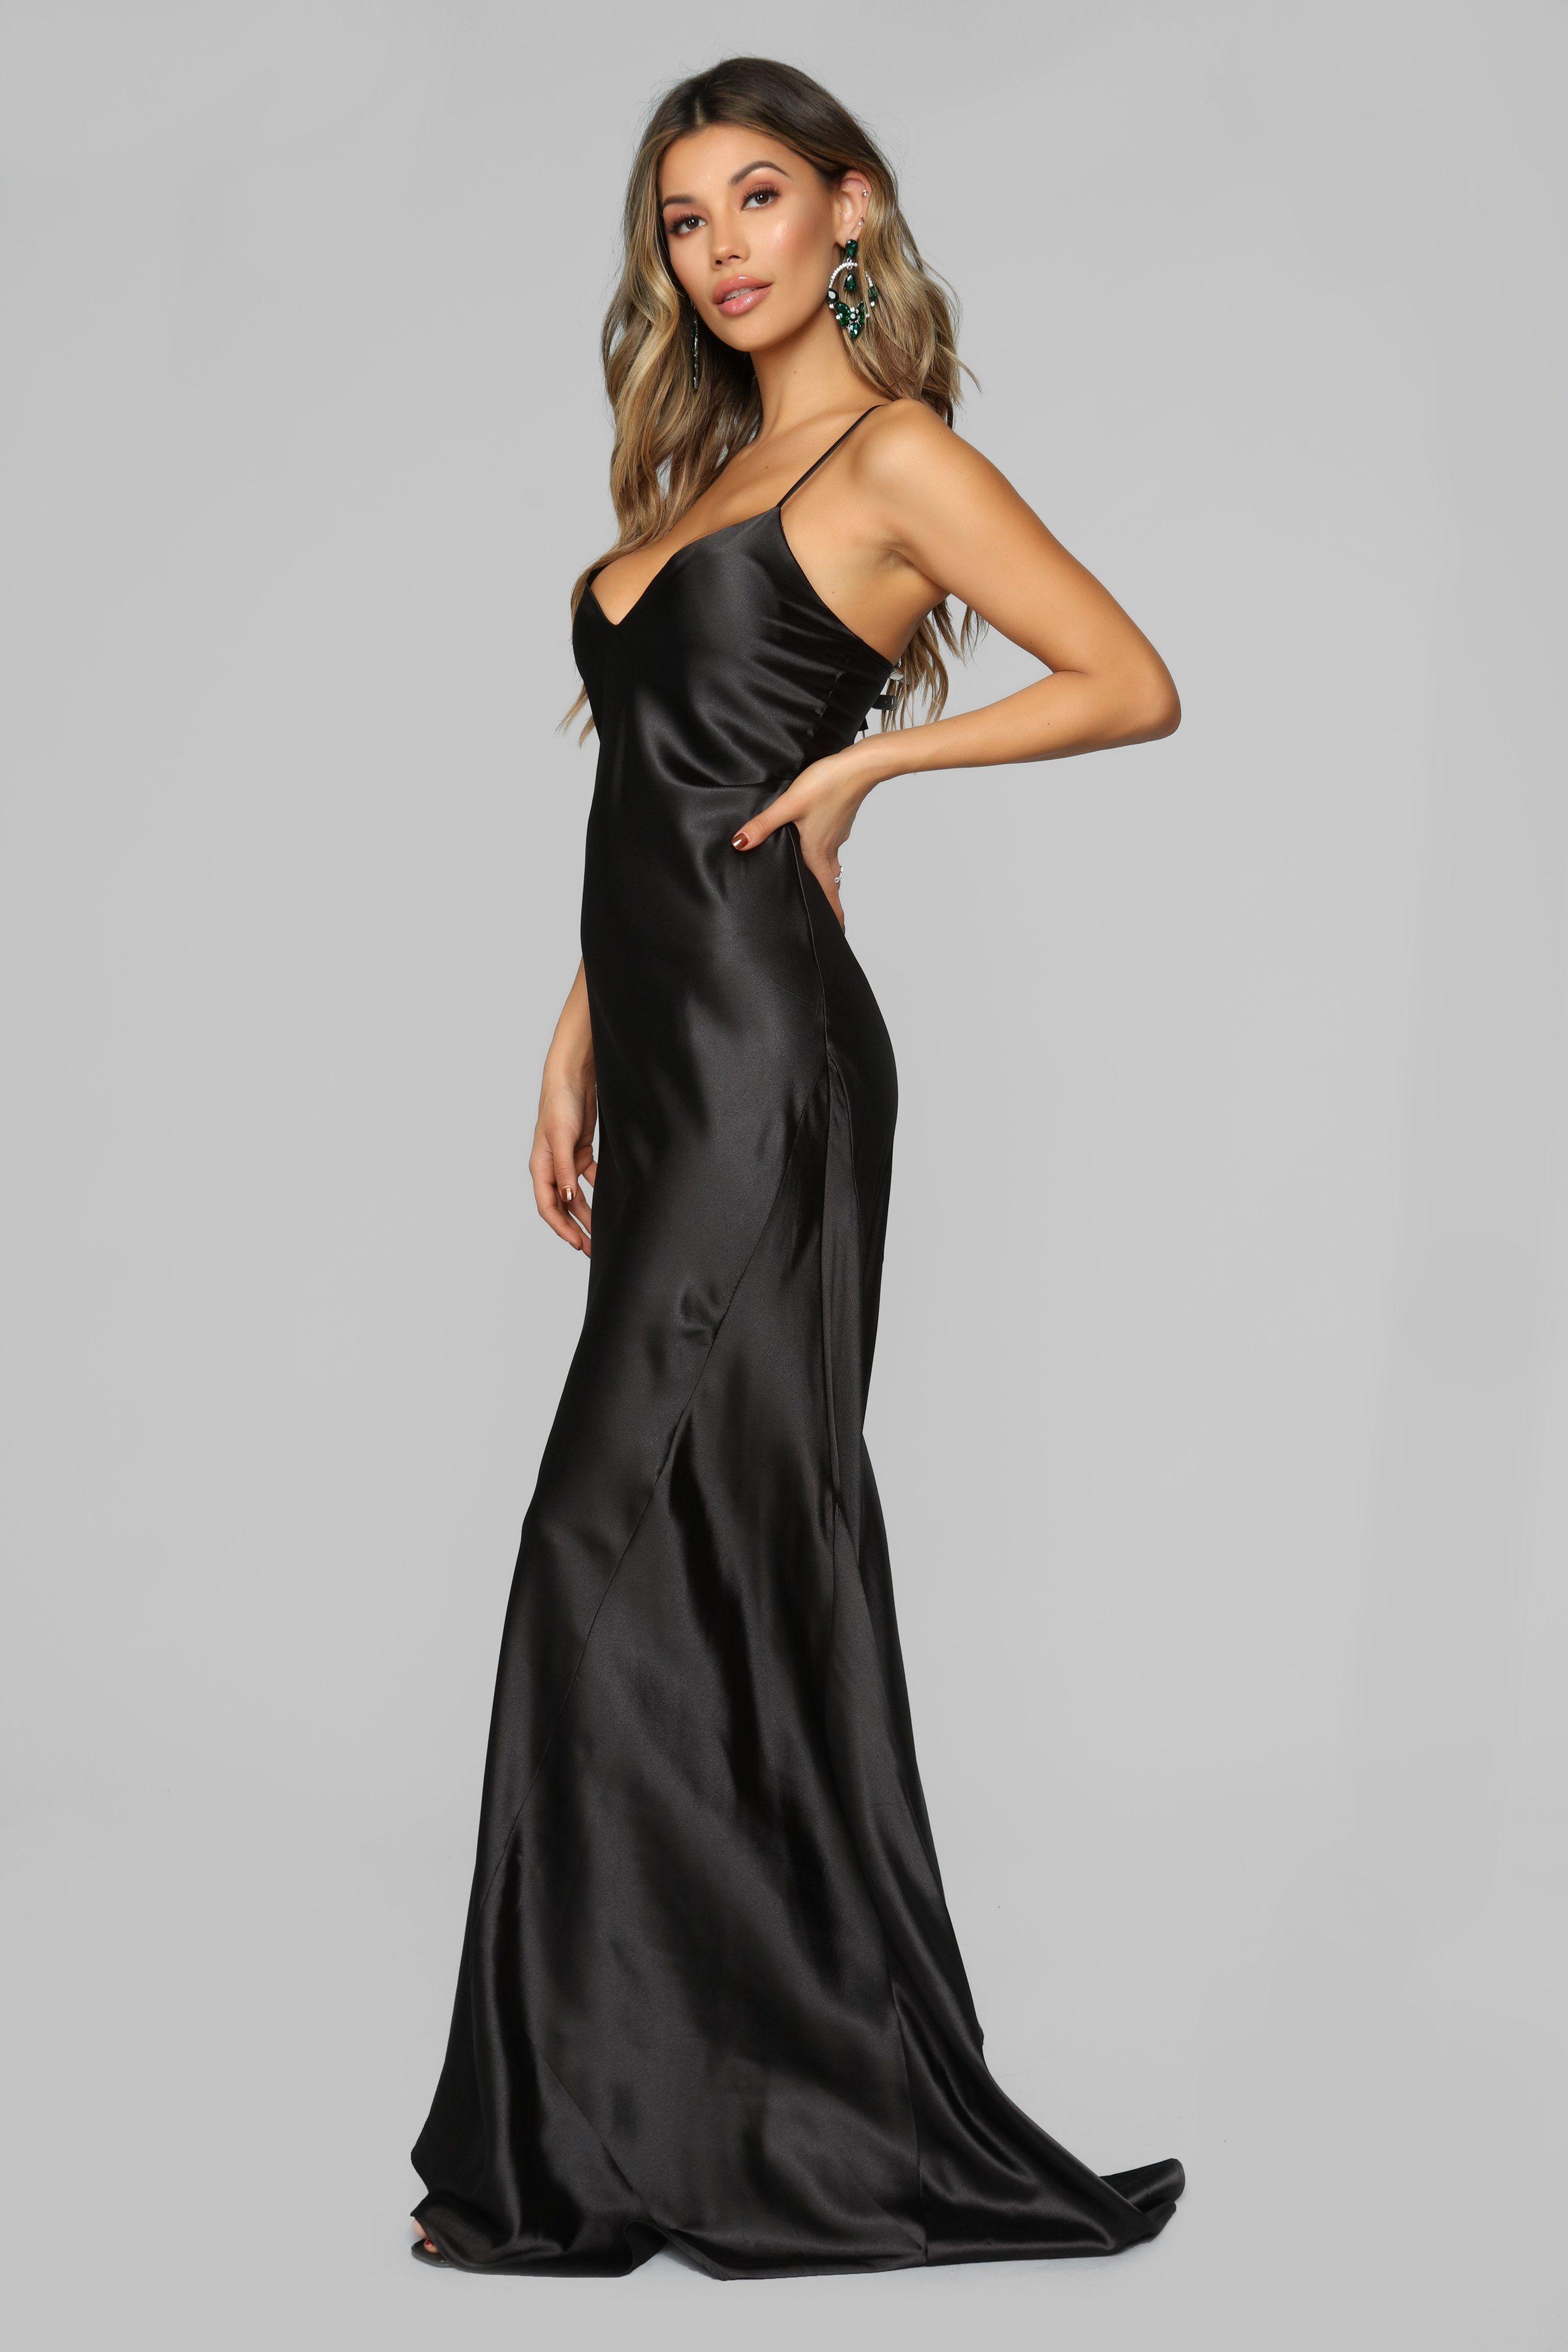 ac2ce7cfb6a6 Figure Hugging Satin Maxi Dress - Black in 2019 | fashion week ...